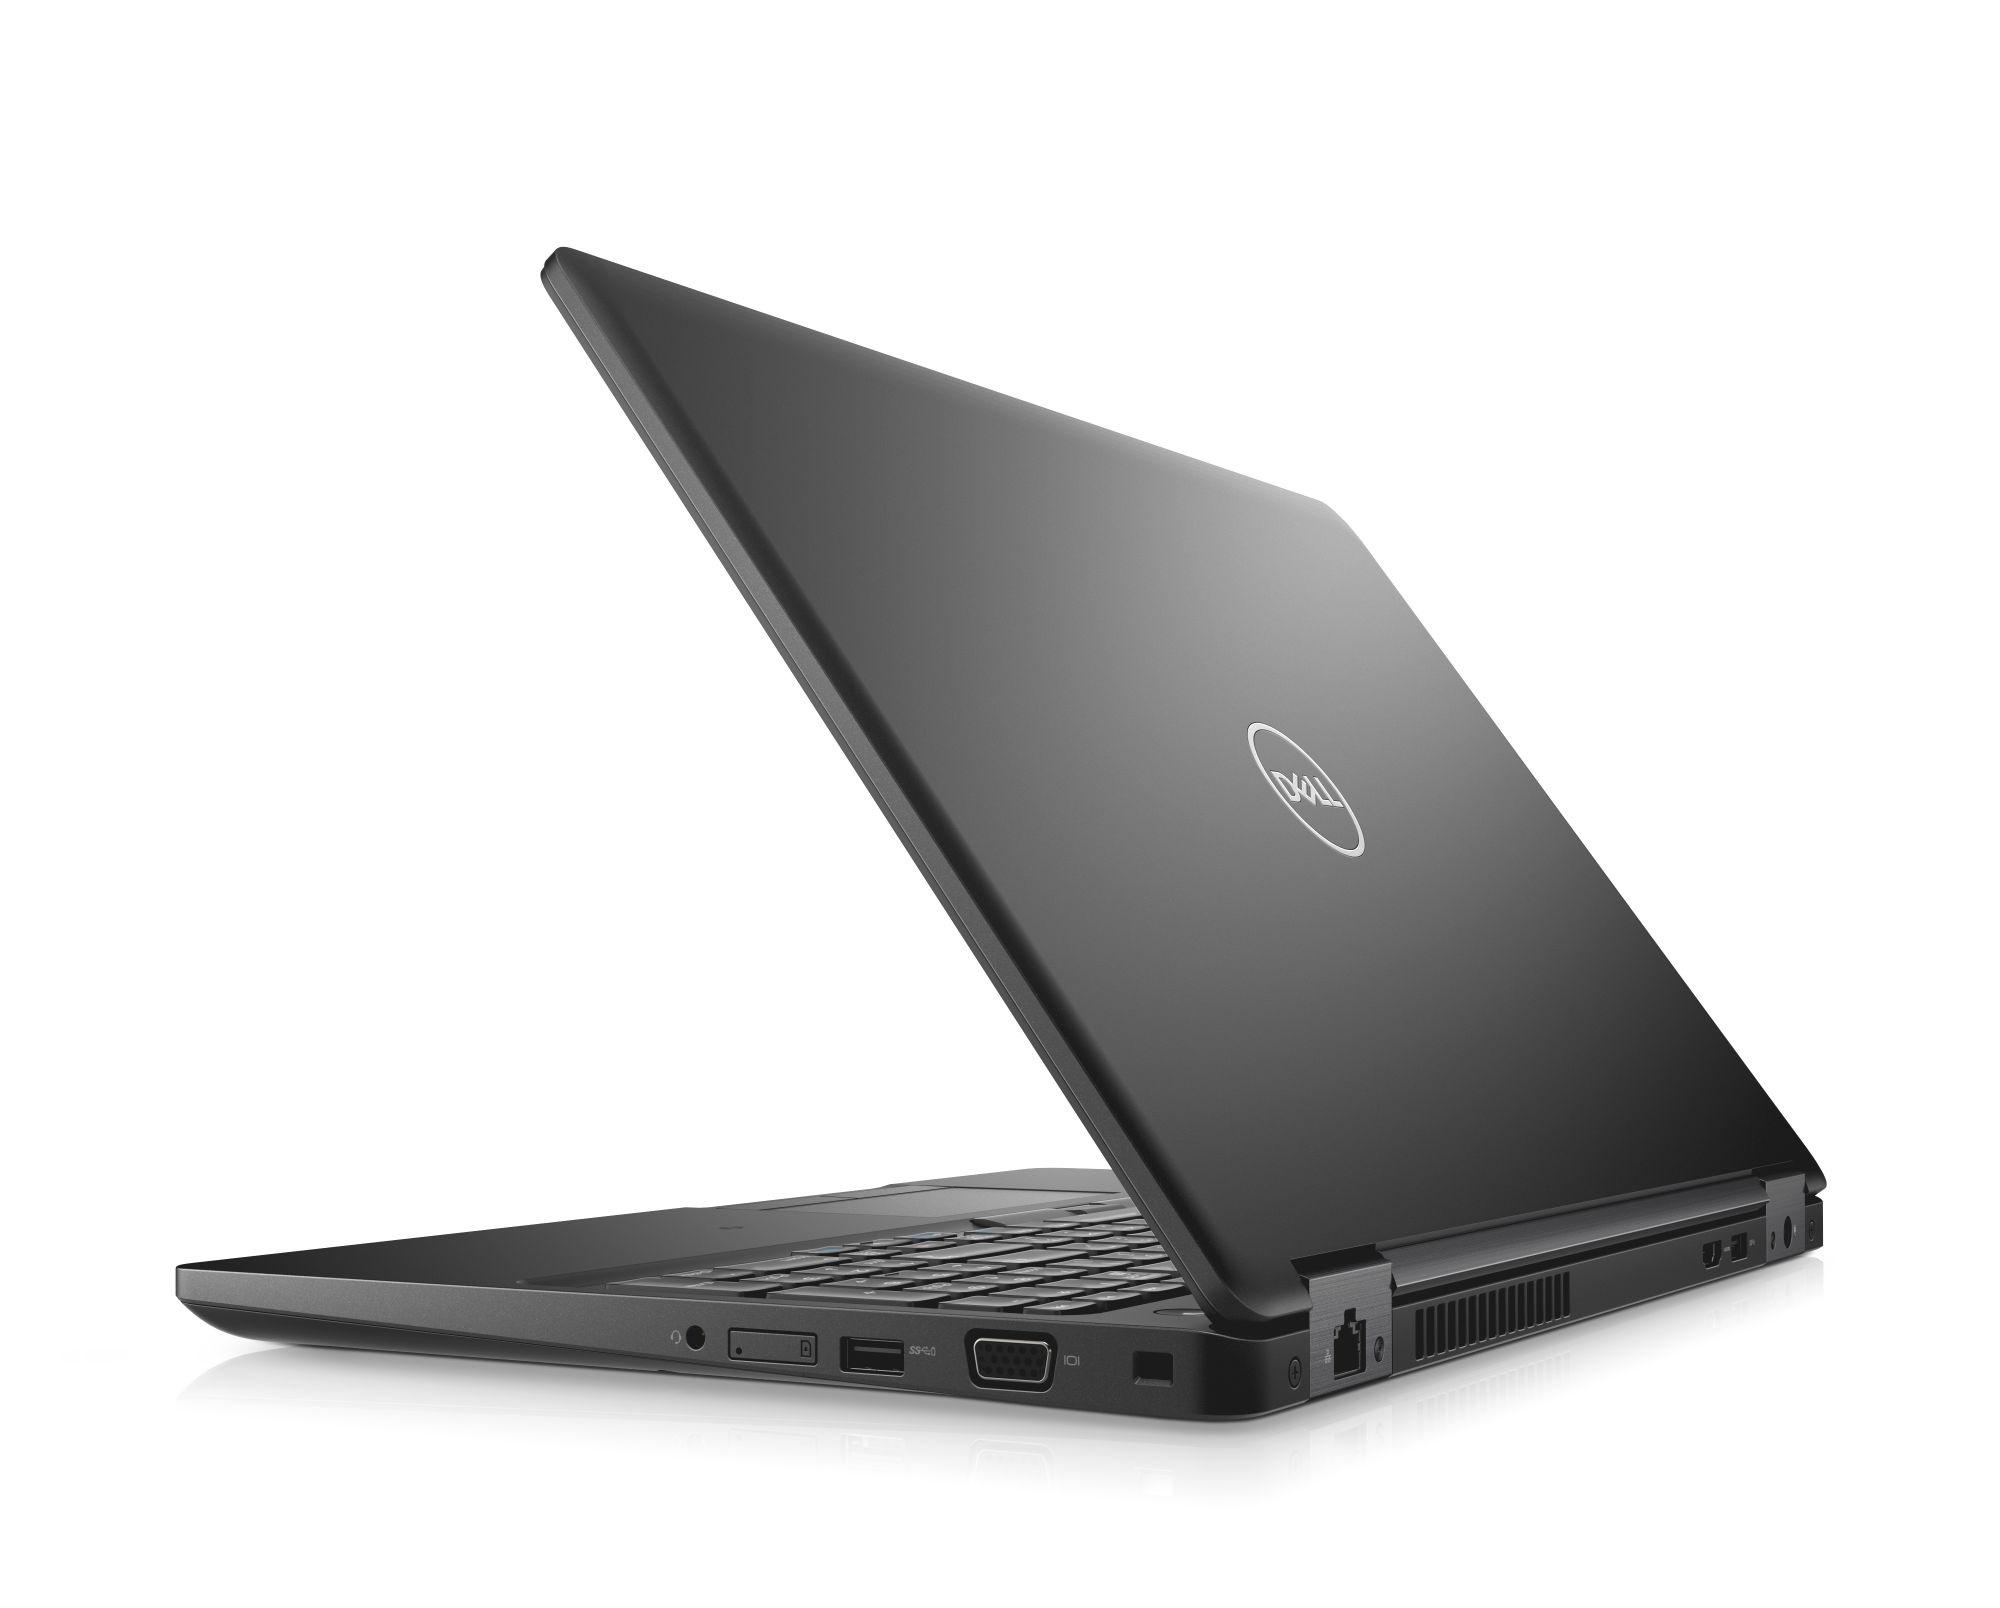 "Dell Precision 3530 15"" FHD i7-8850H/16GB/256GB SSD/P600-4GB/THB/SCR/MCR/HDMI/VGA/W10P/3RNBD/Černý"